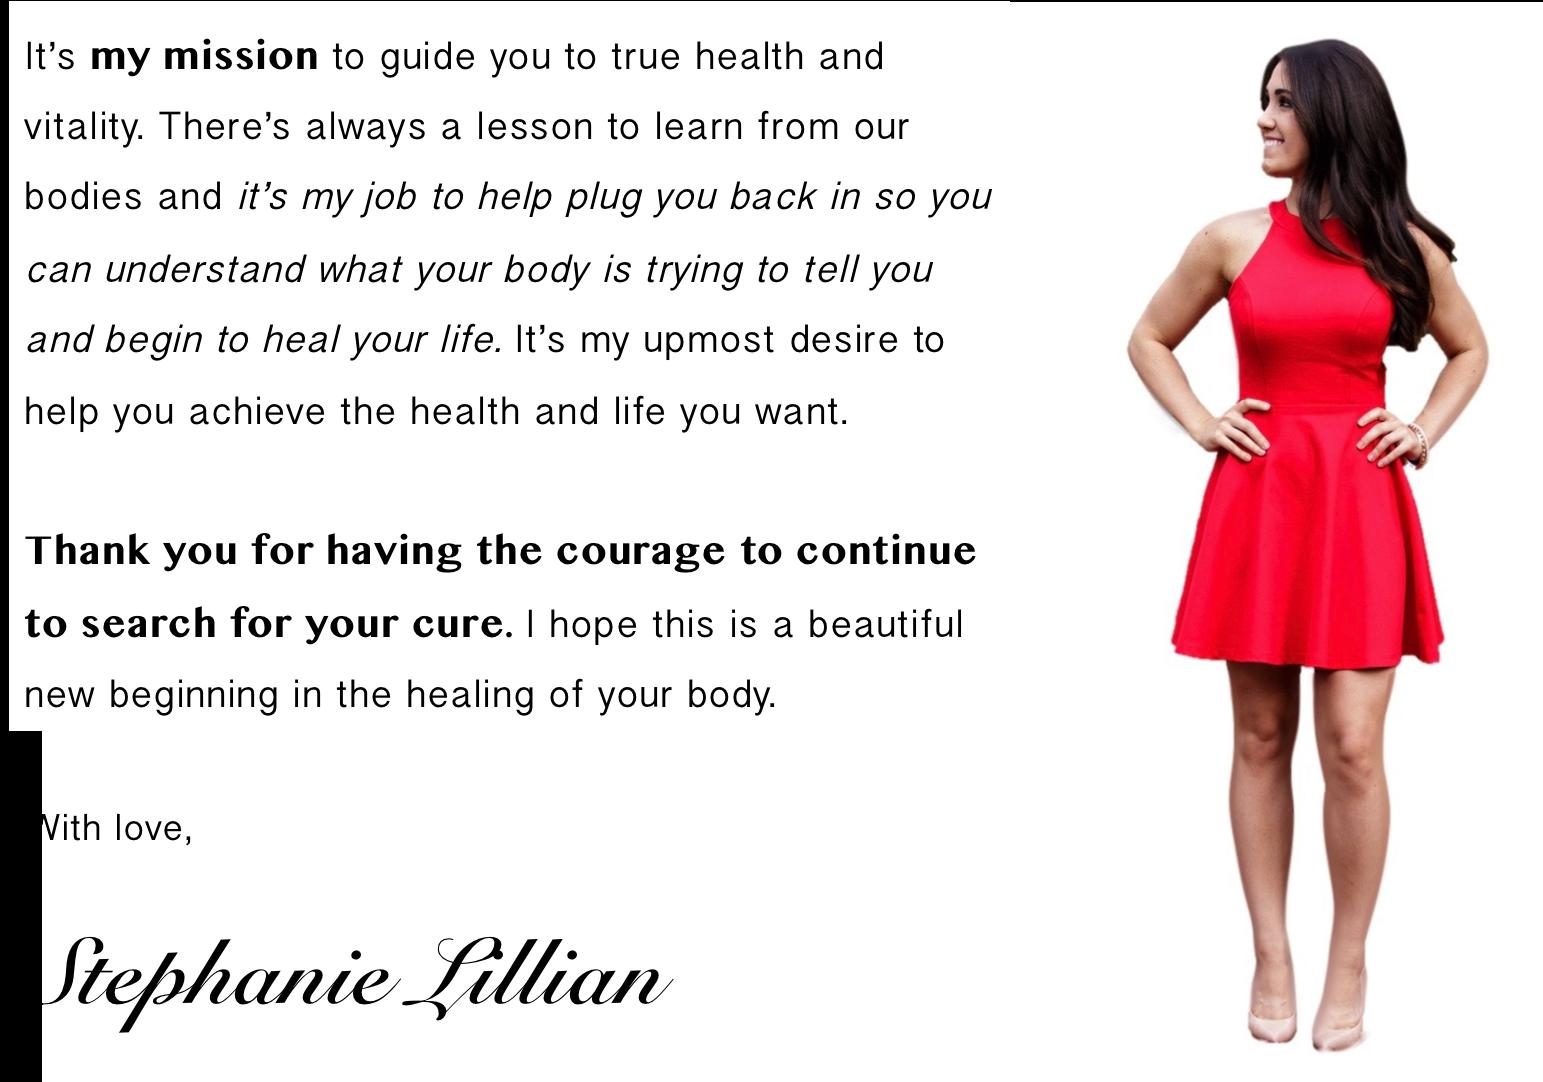 About Stephanie Lillian